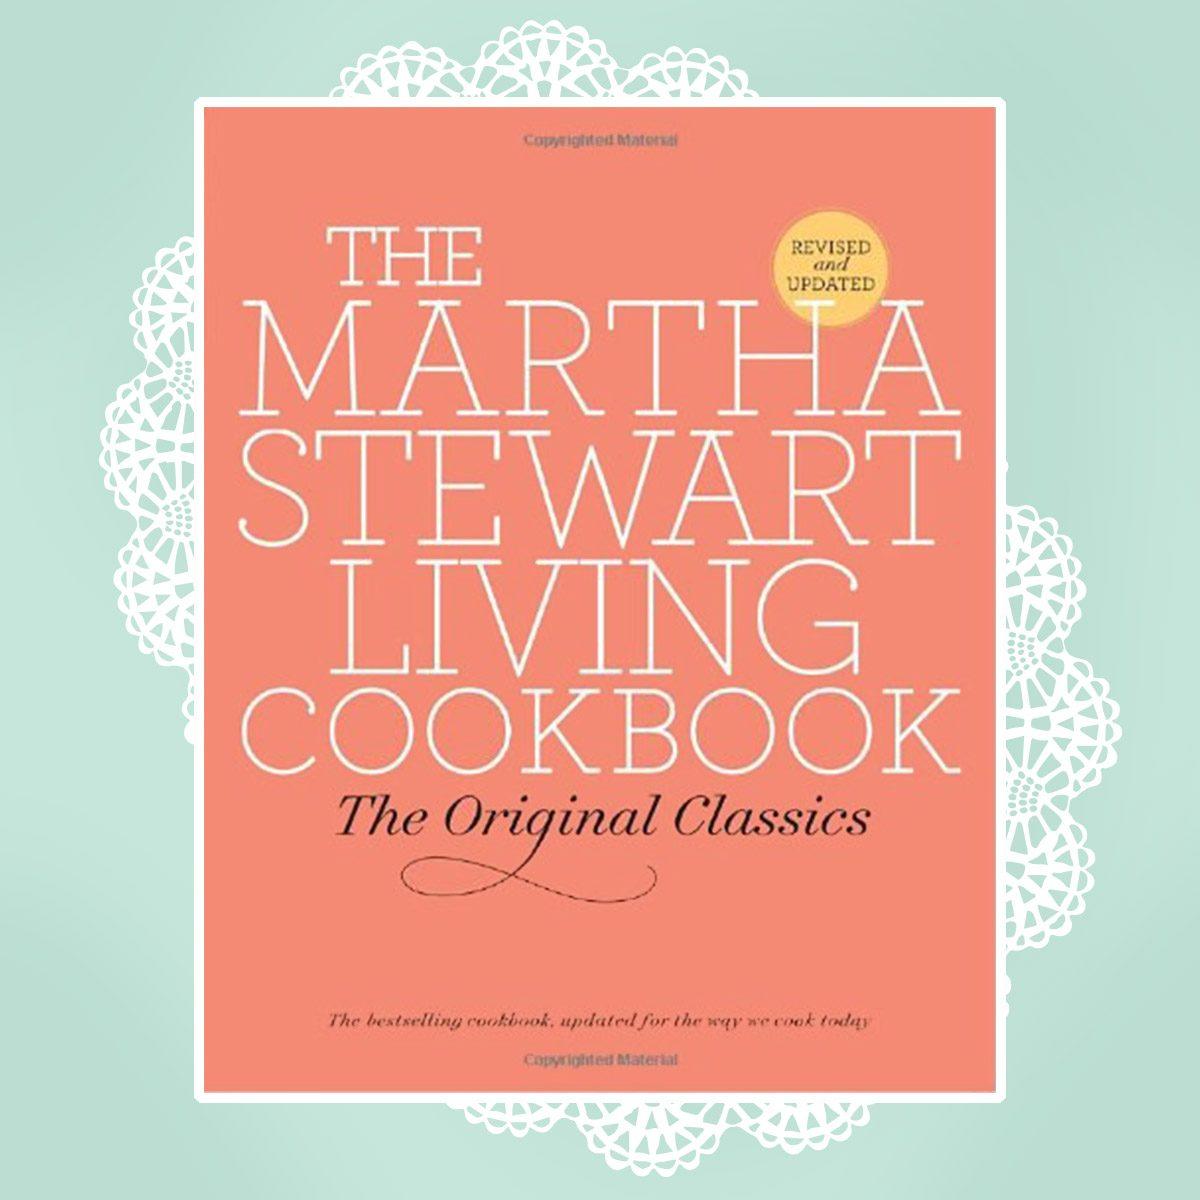 The Martha Stewart Living Cookbook- The Original Classics